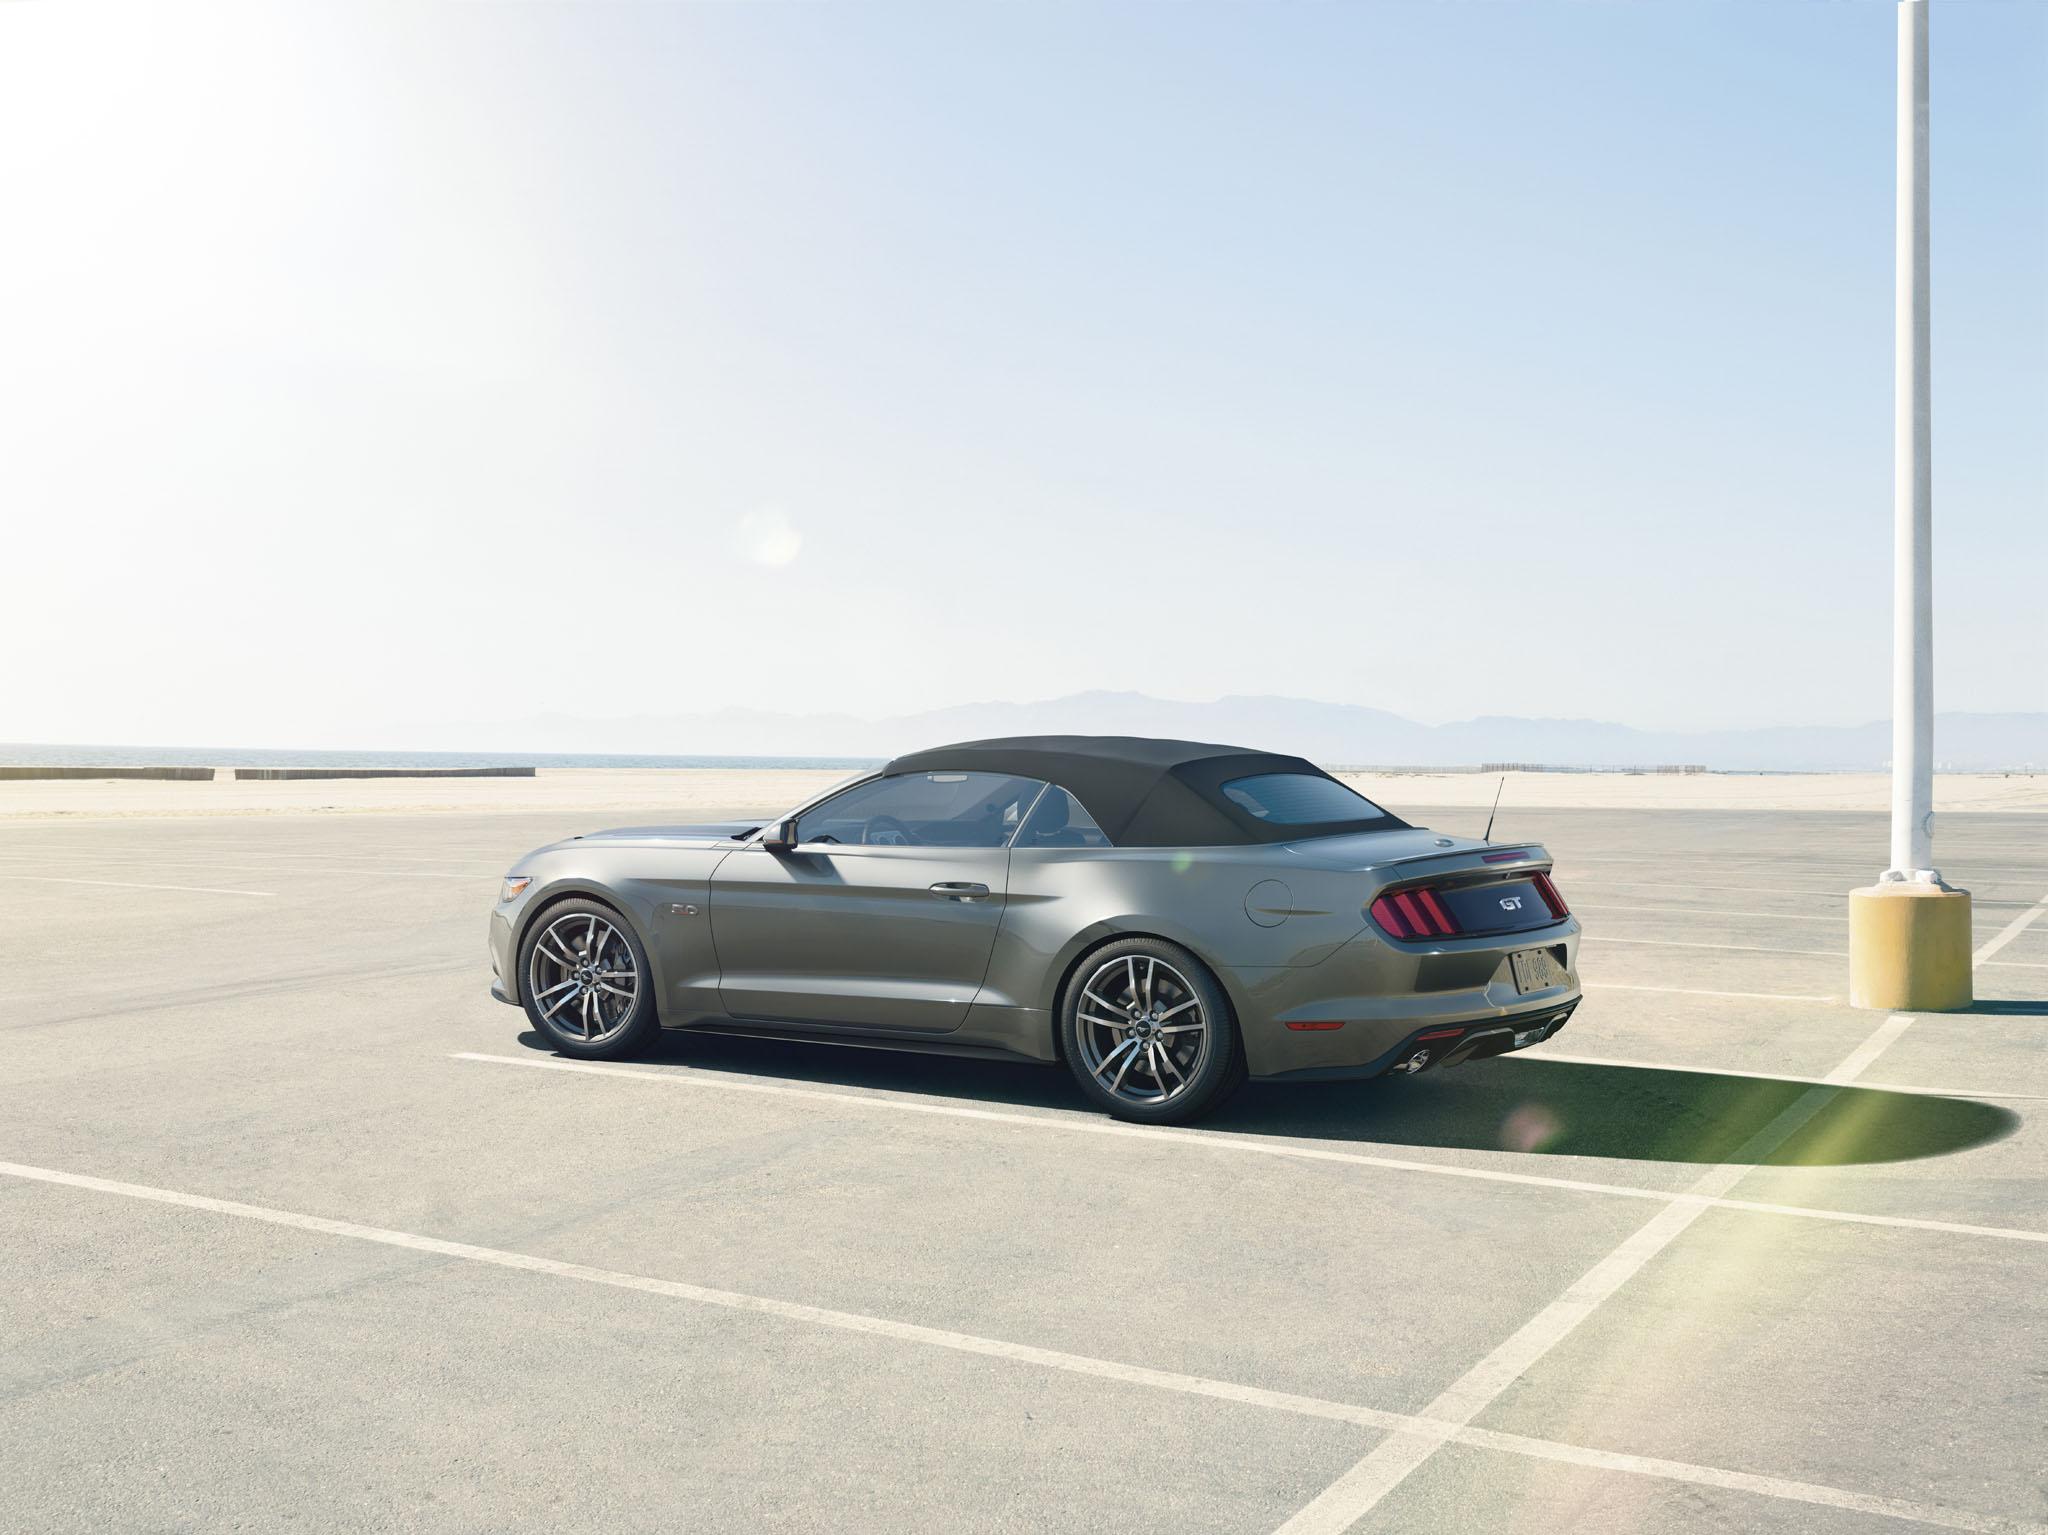 Mustang 05